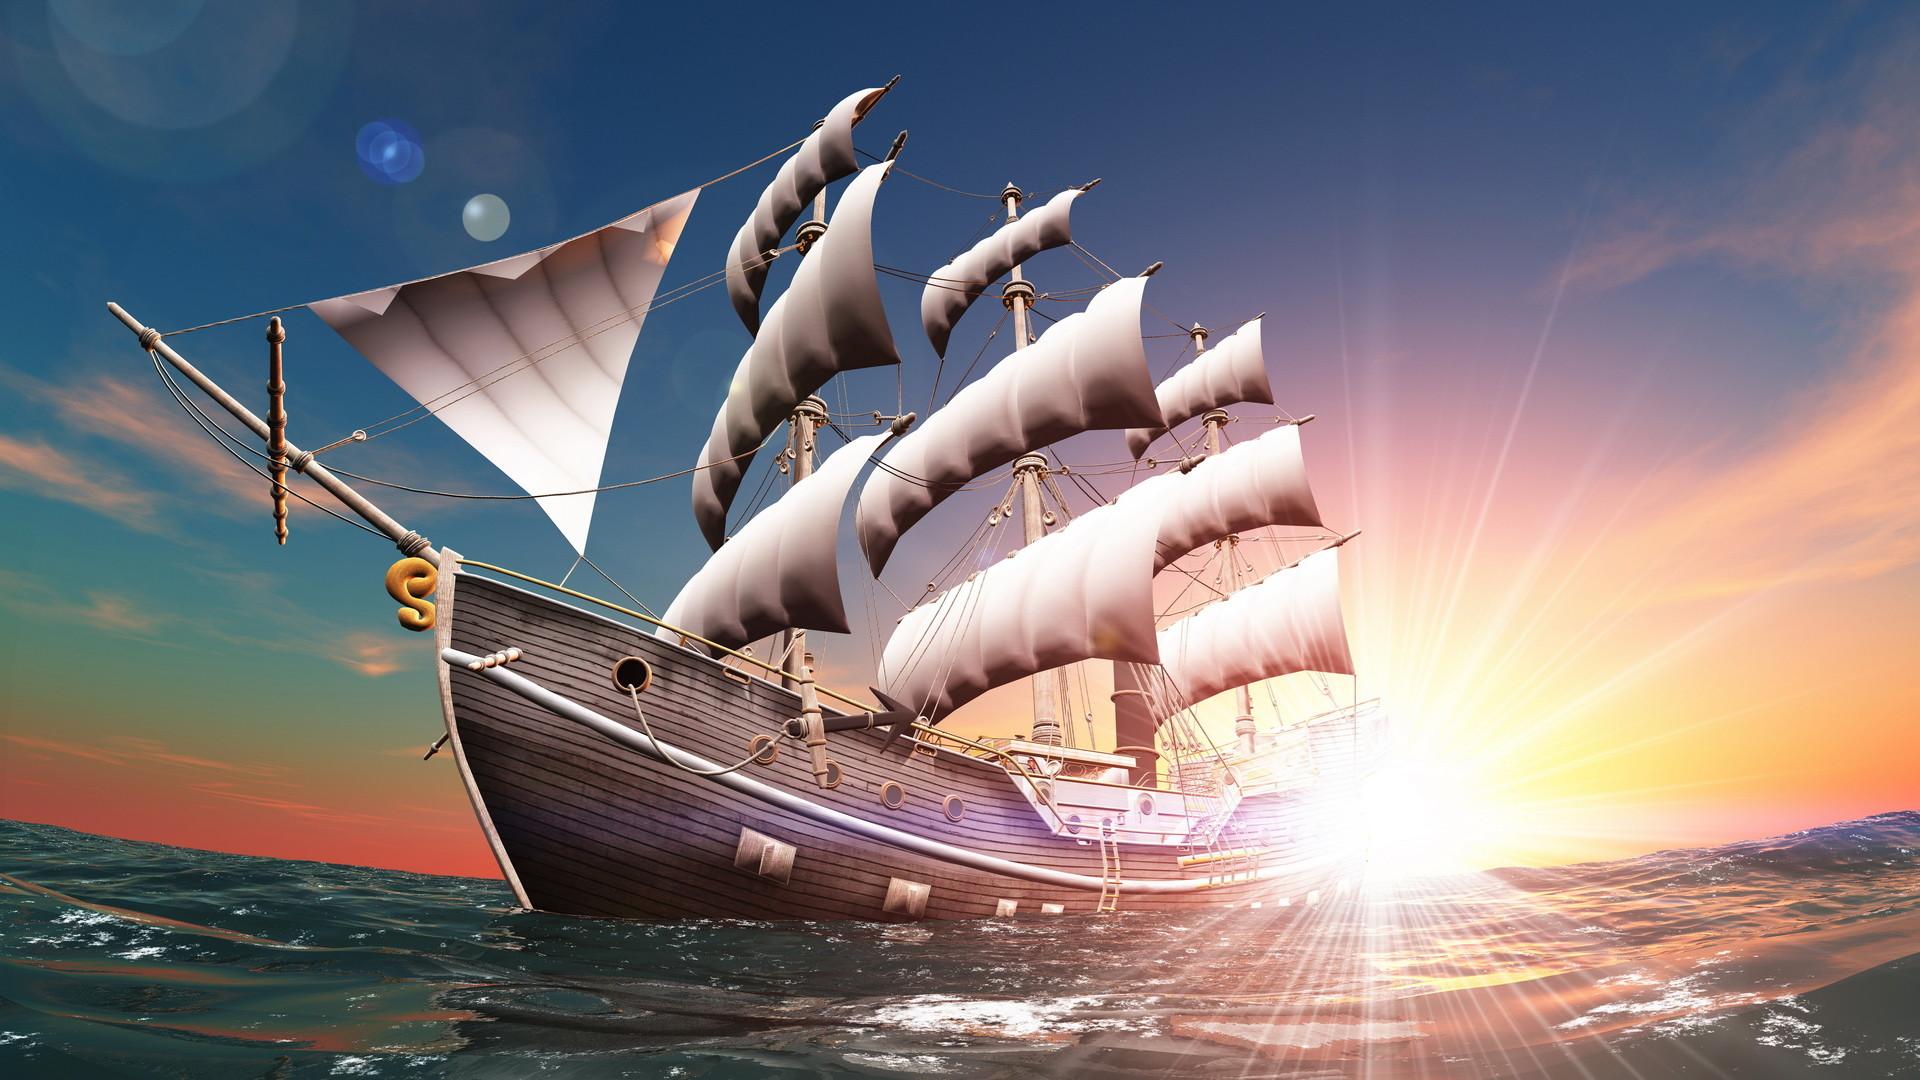 Sailing Ship 4K Ultra HD wallpaper | 4k-Wallpaper.Net